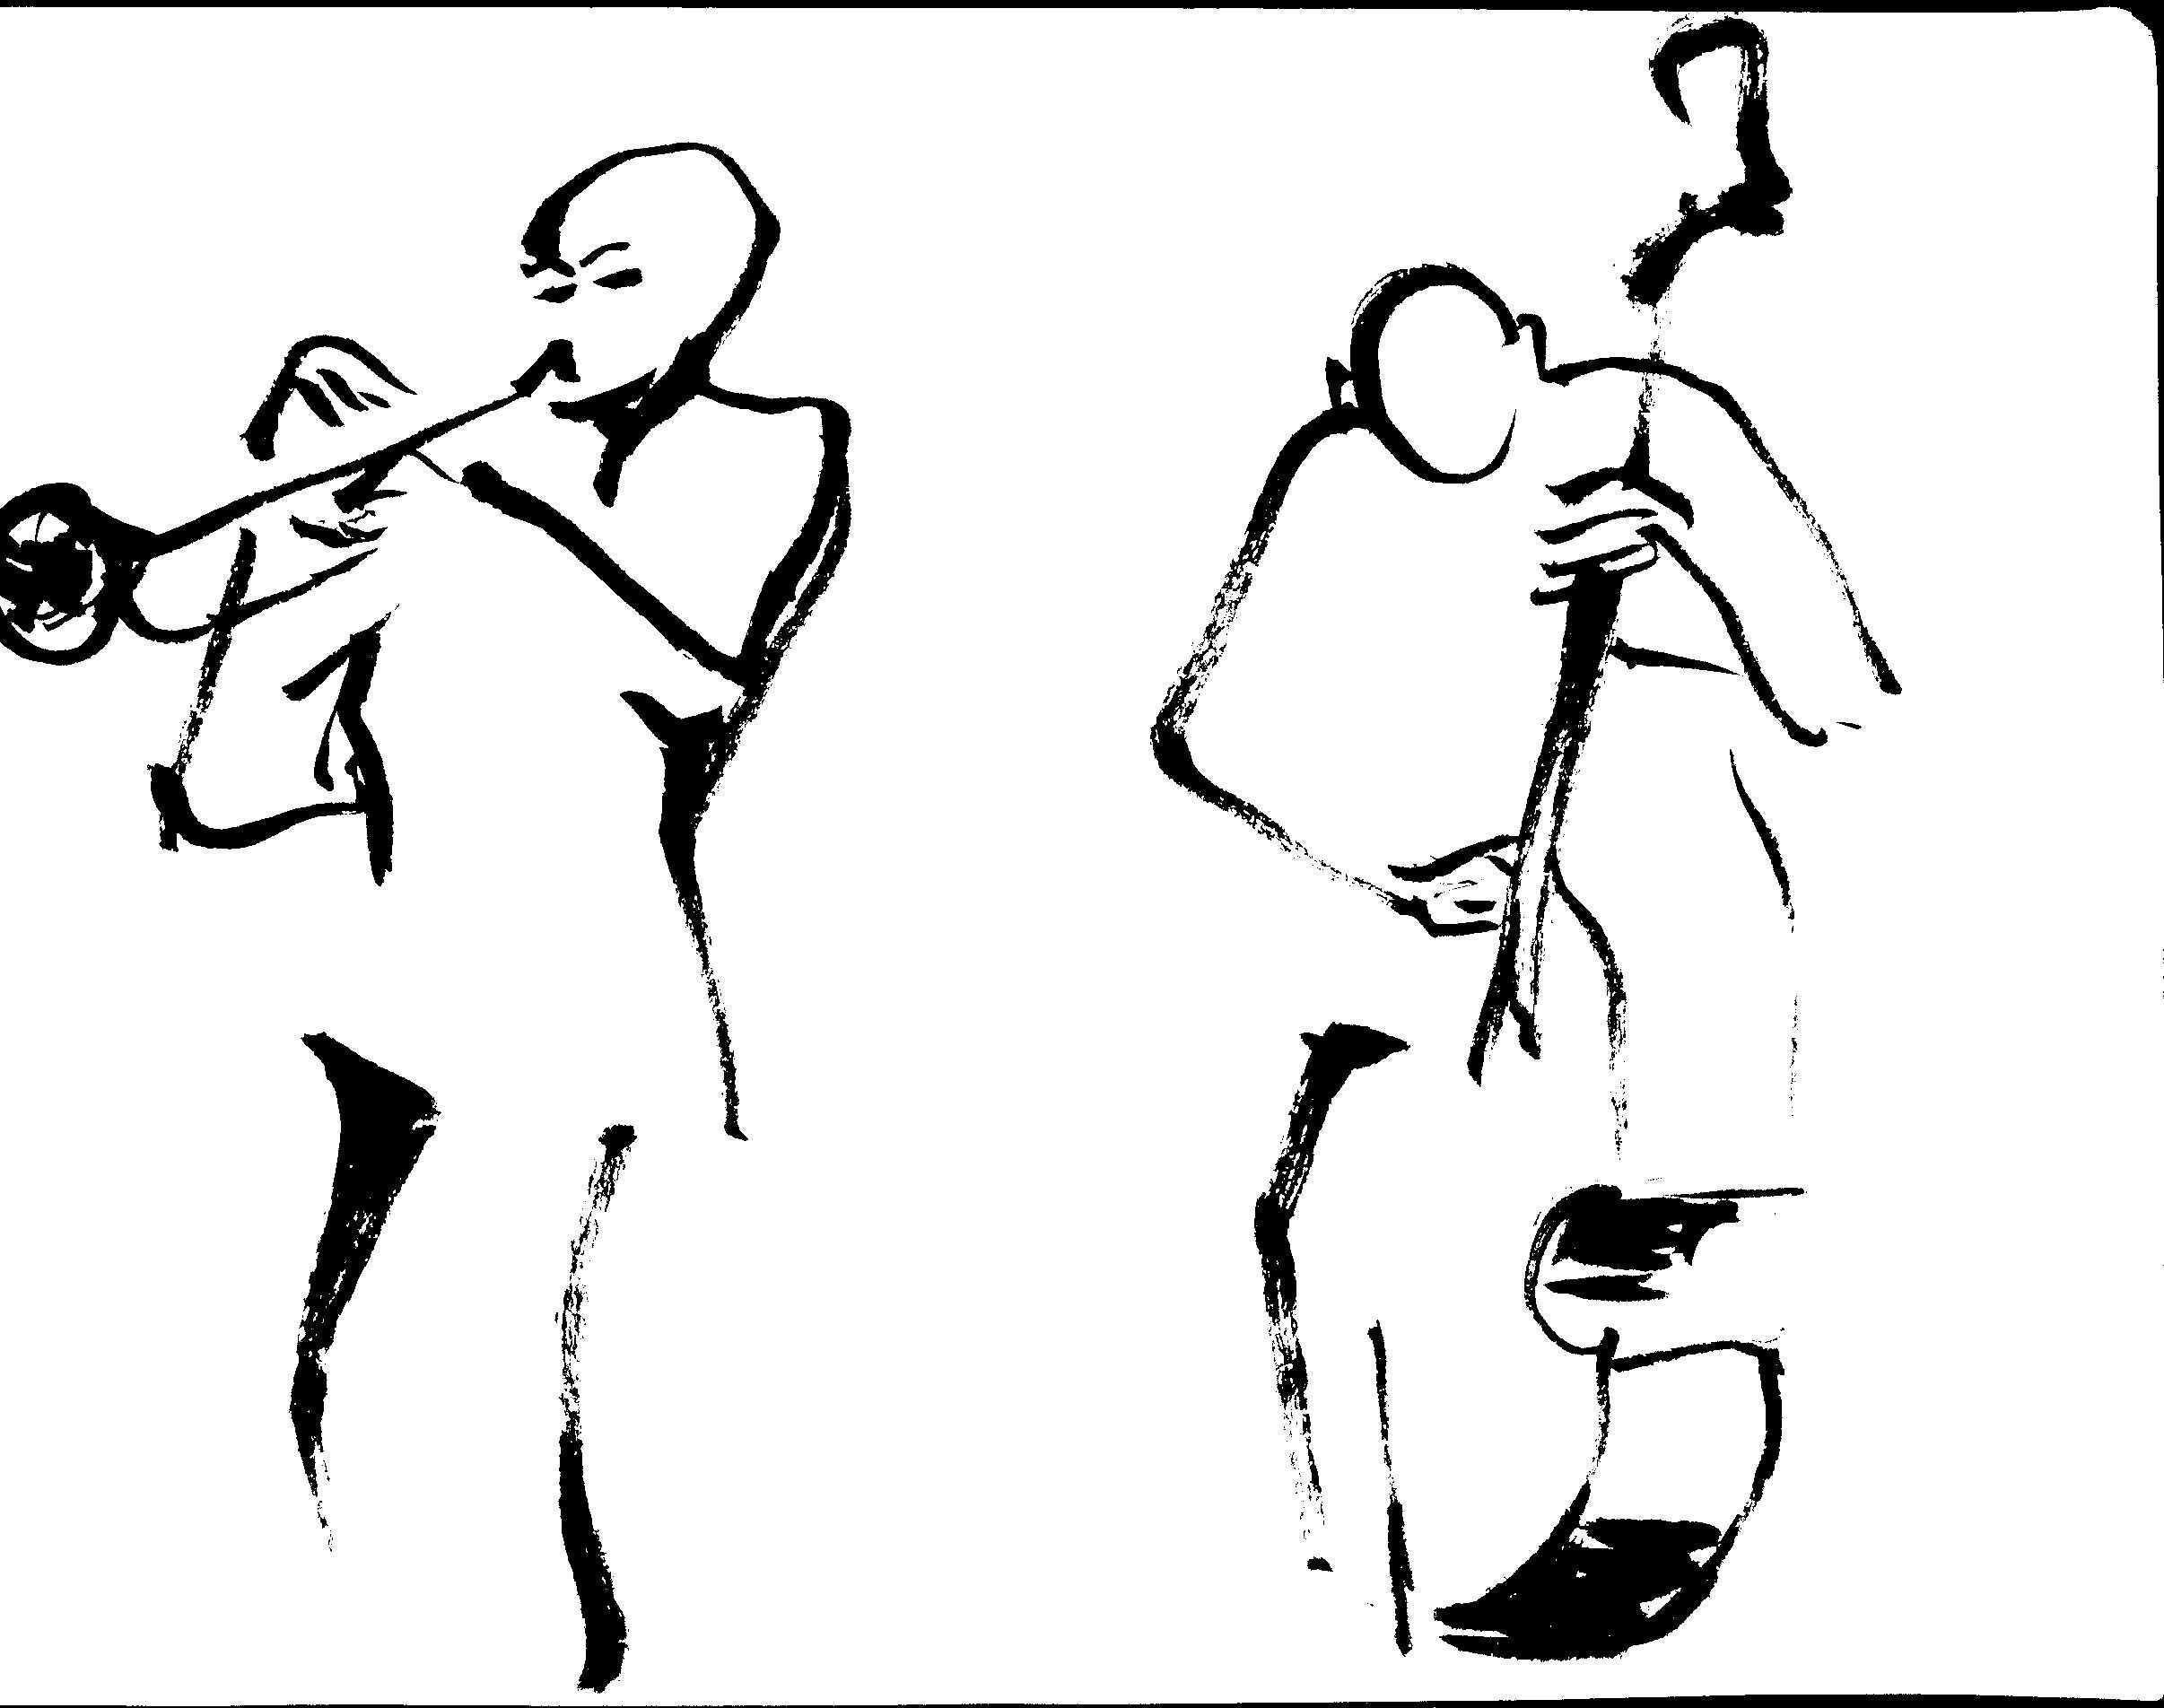 trumpet & bass player Lyon feb 2013